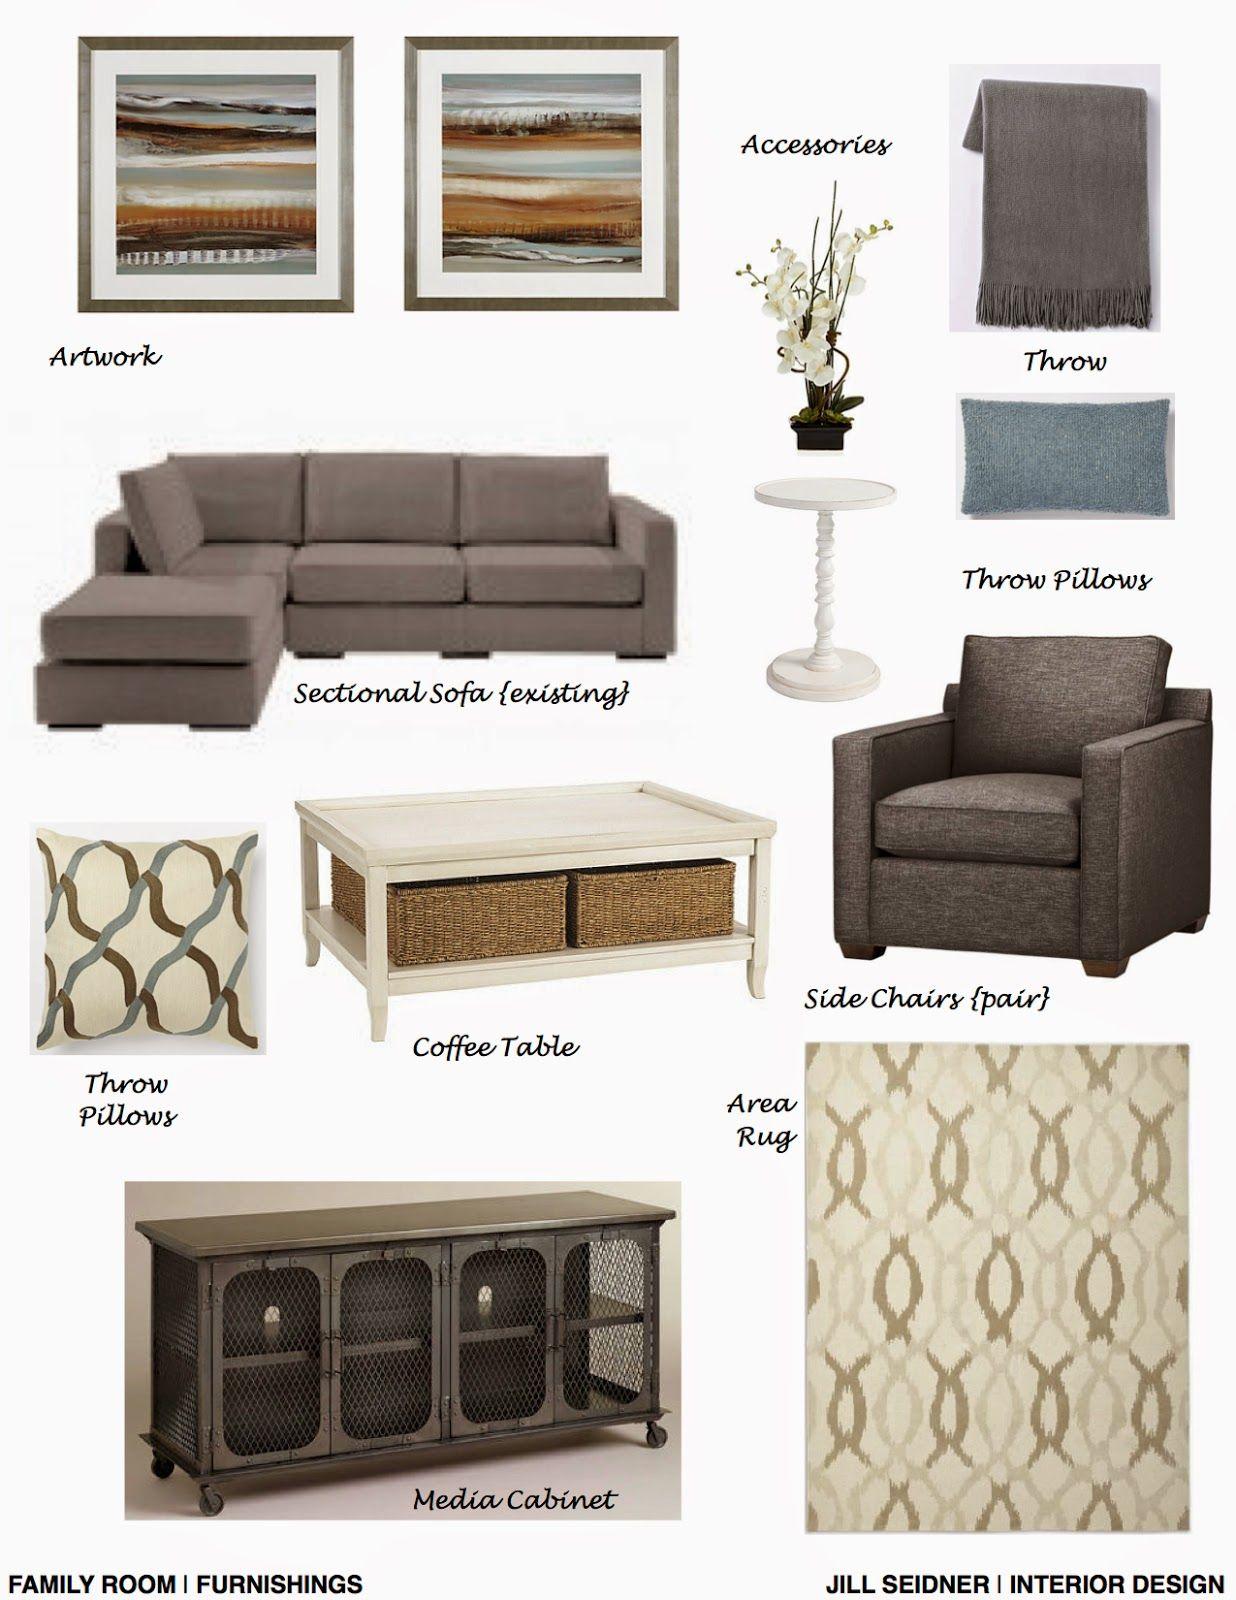 Help Designing A Room: Interior Design Help, Interior Design